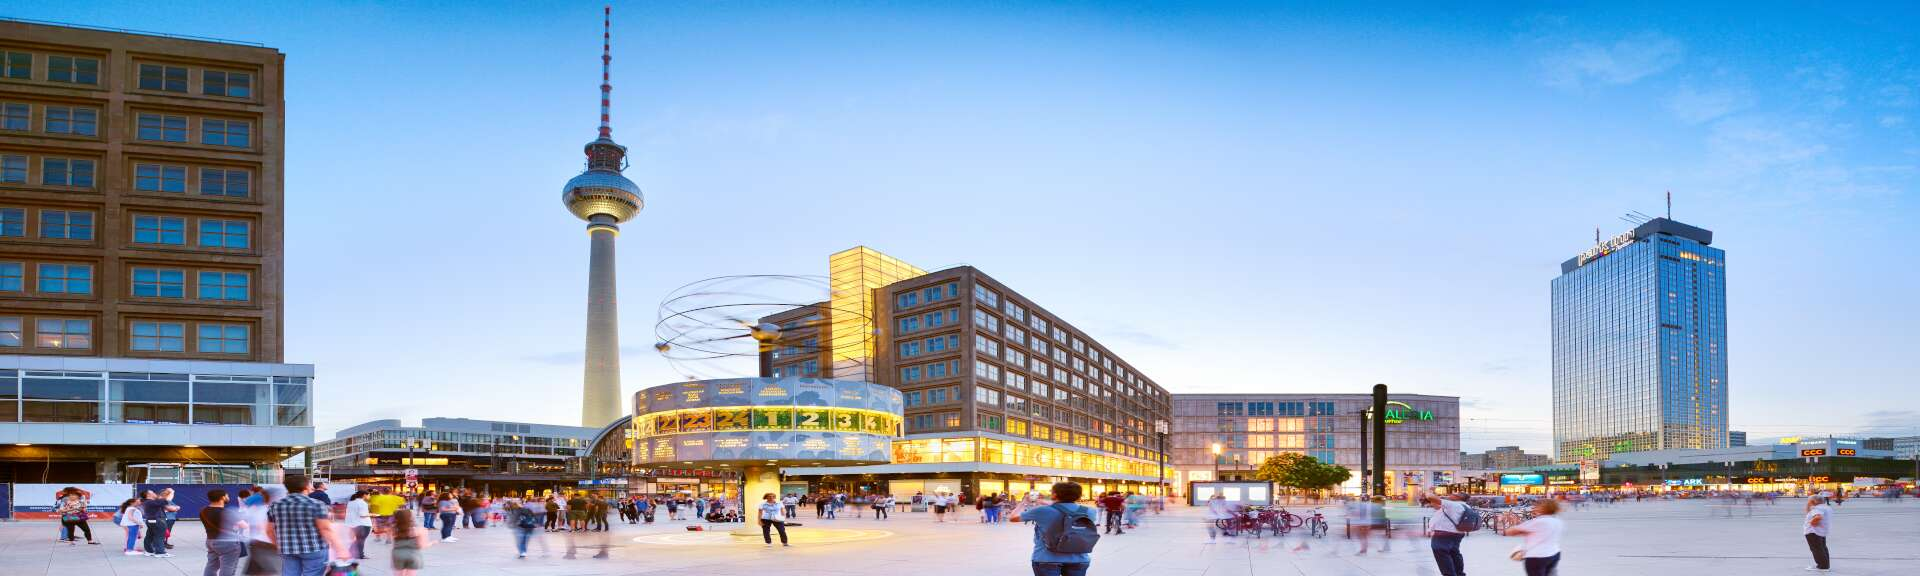 Klassenfahrt Berlin Alexanderplatz